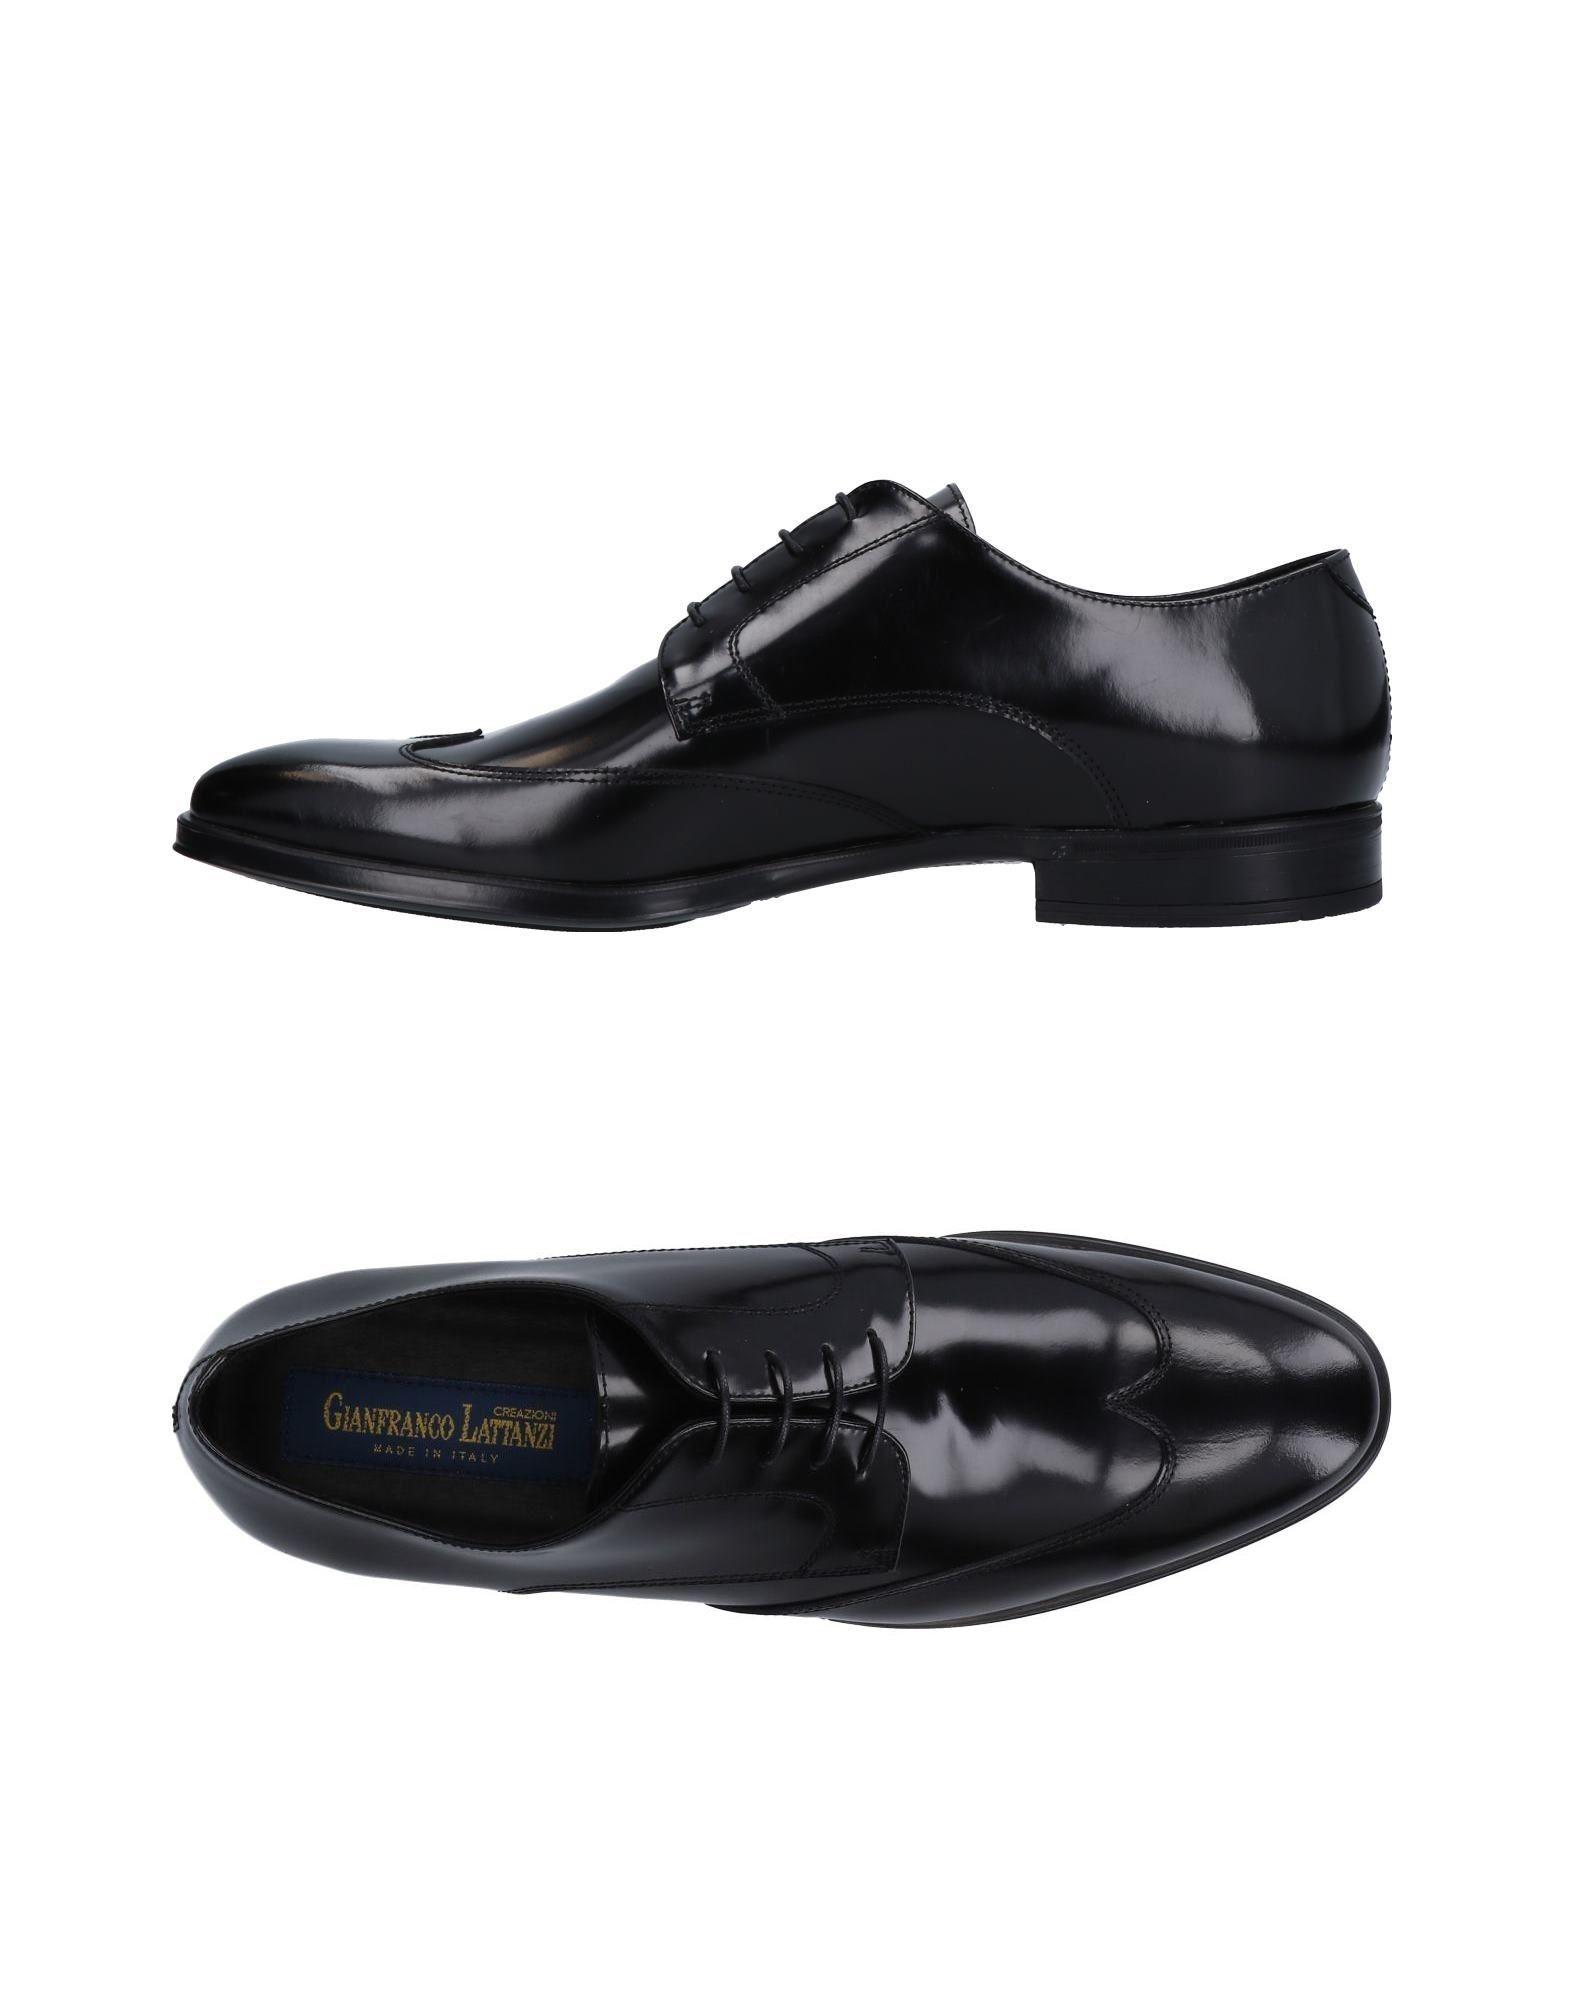 Gianfranco Lattanzi Schnürschuhe Herren  11513054DI Gute Qualität beliebte Schuhe